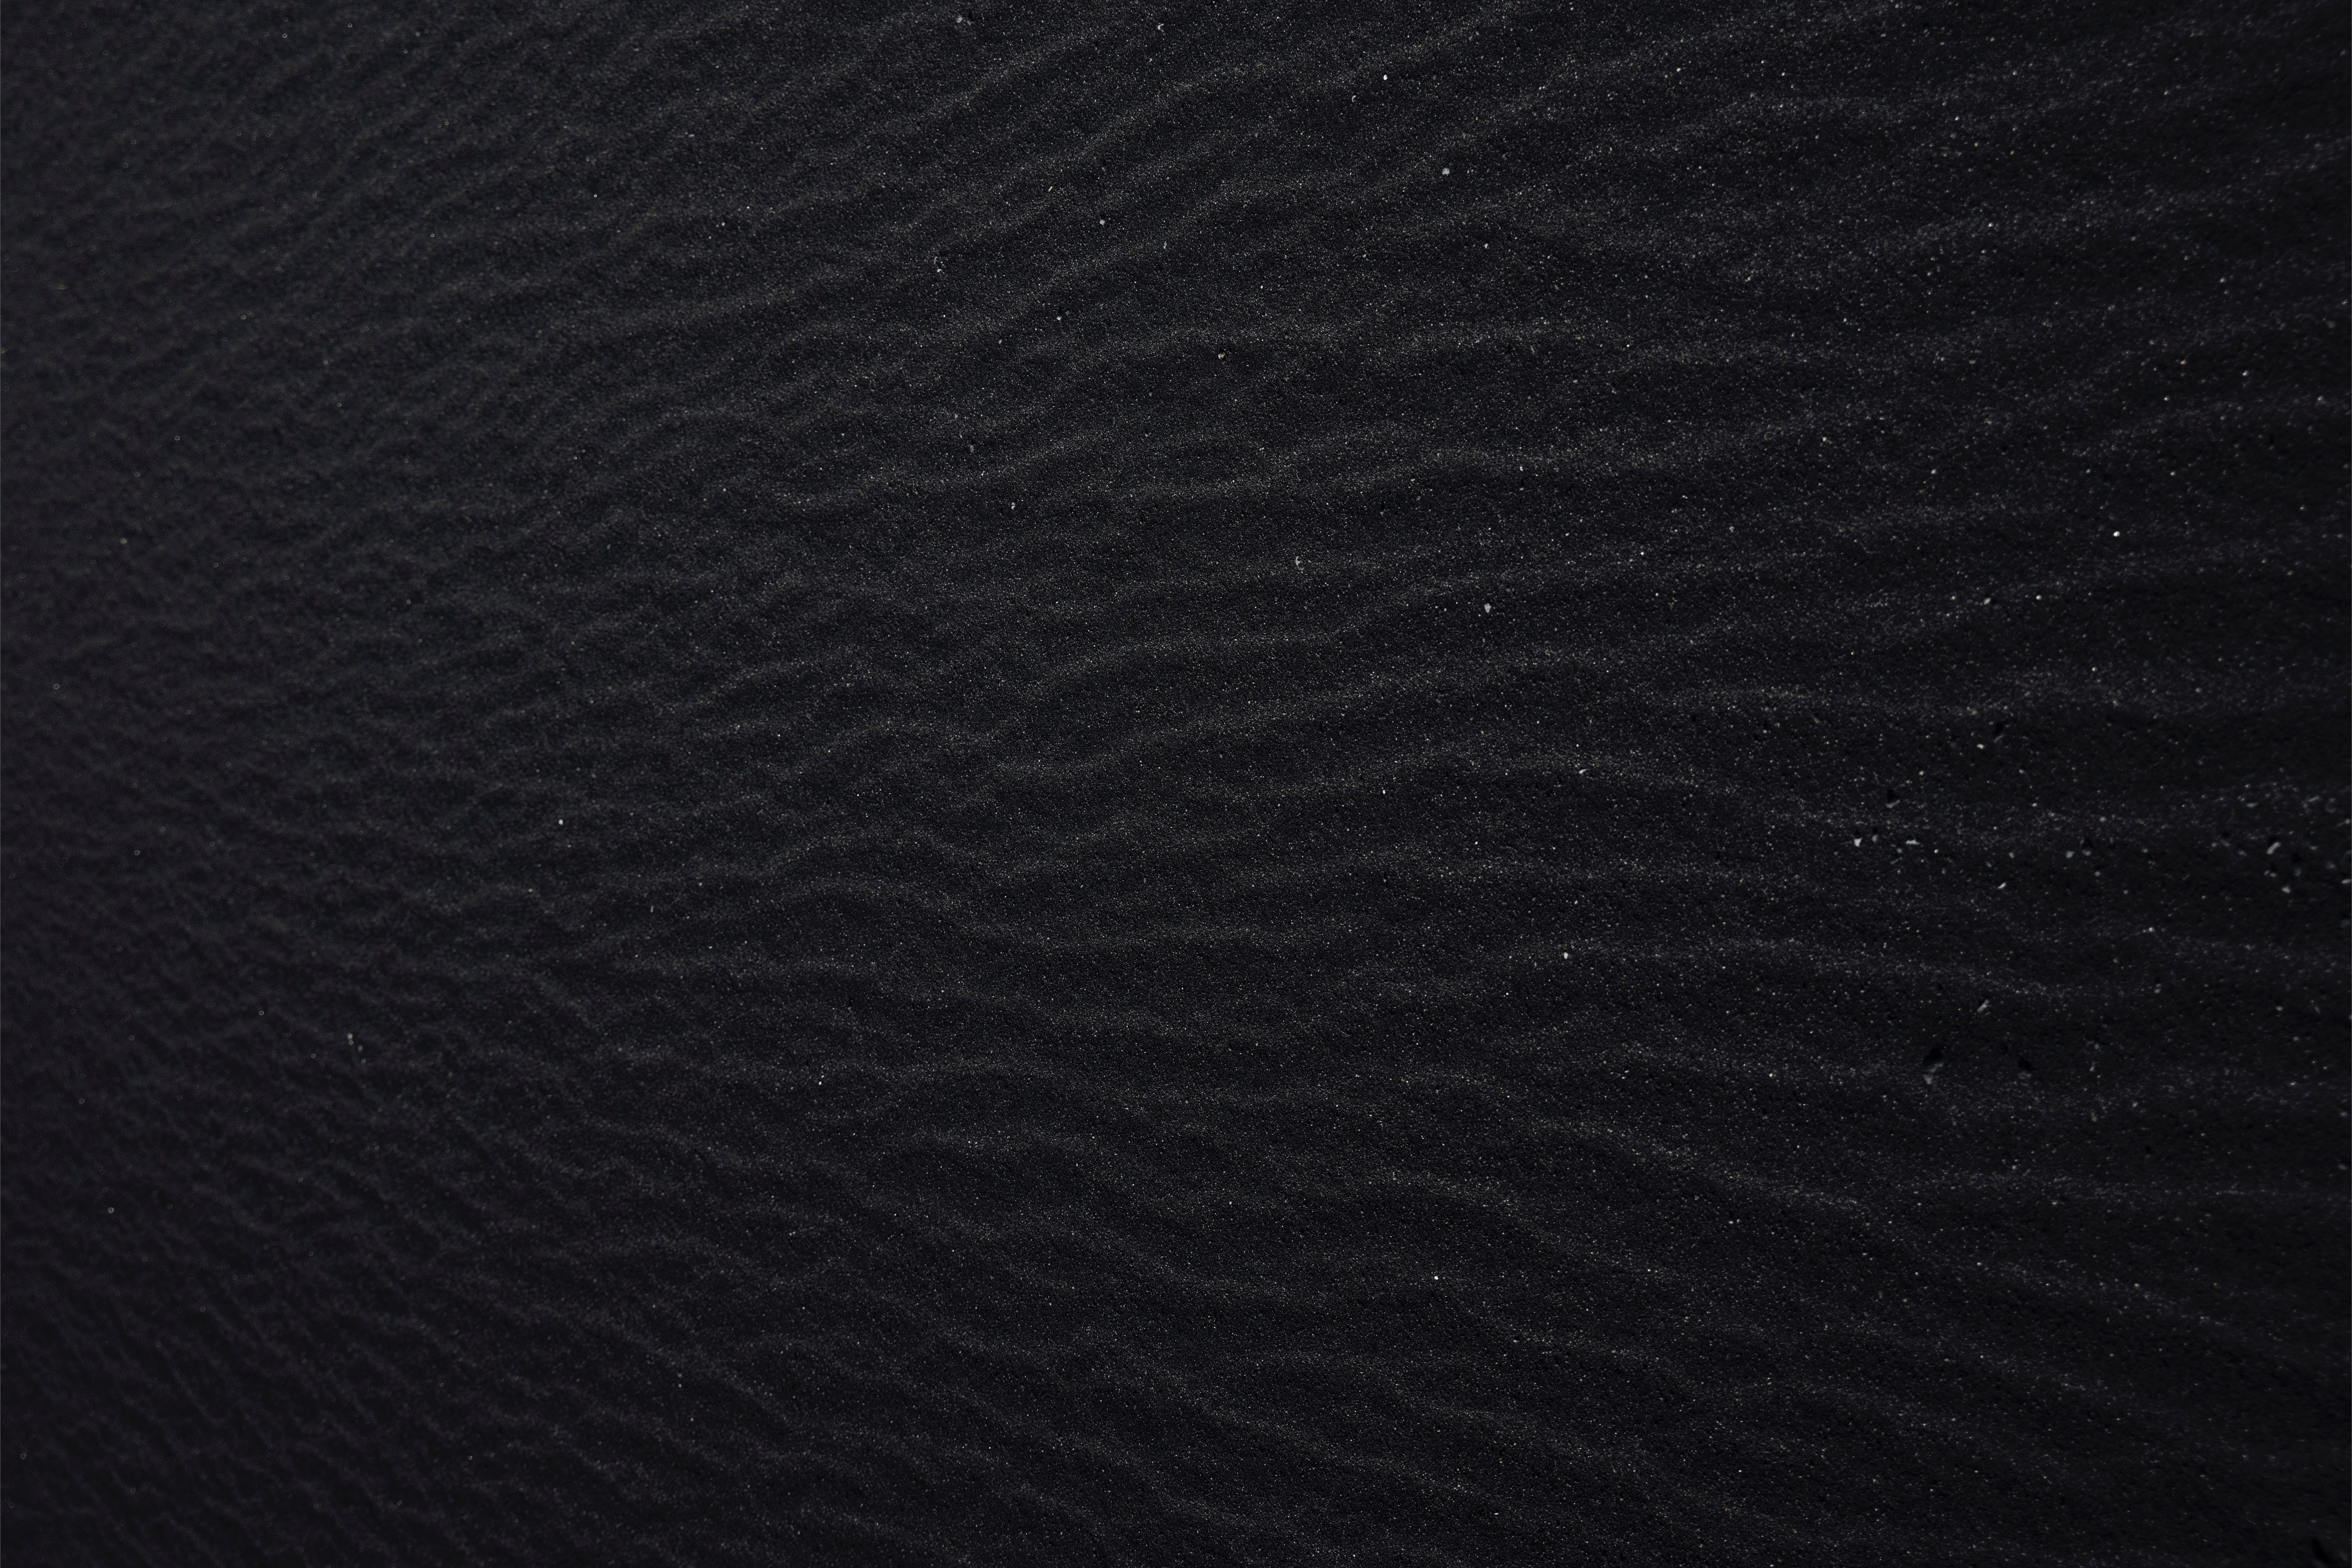 Dark Black Sand Texture 8k, HD Abstract, 4k Wallpapers ...